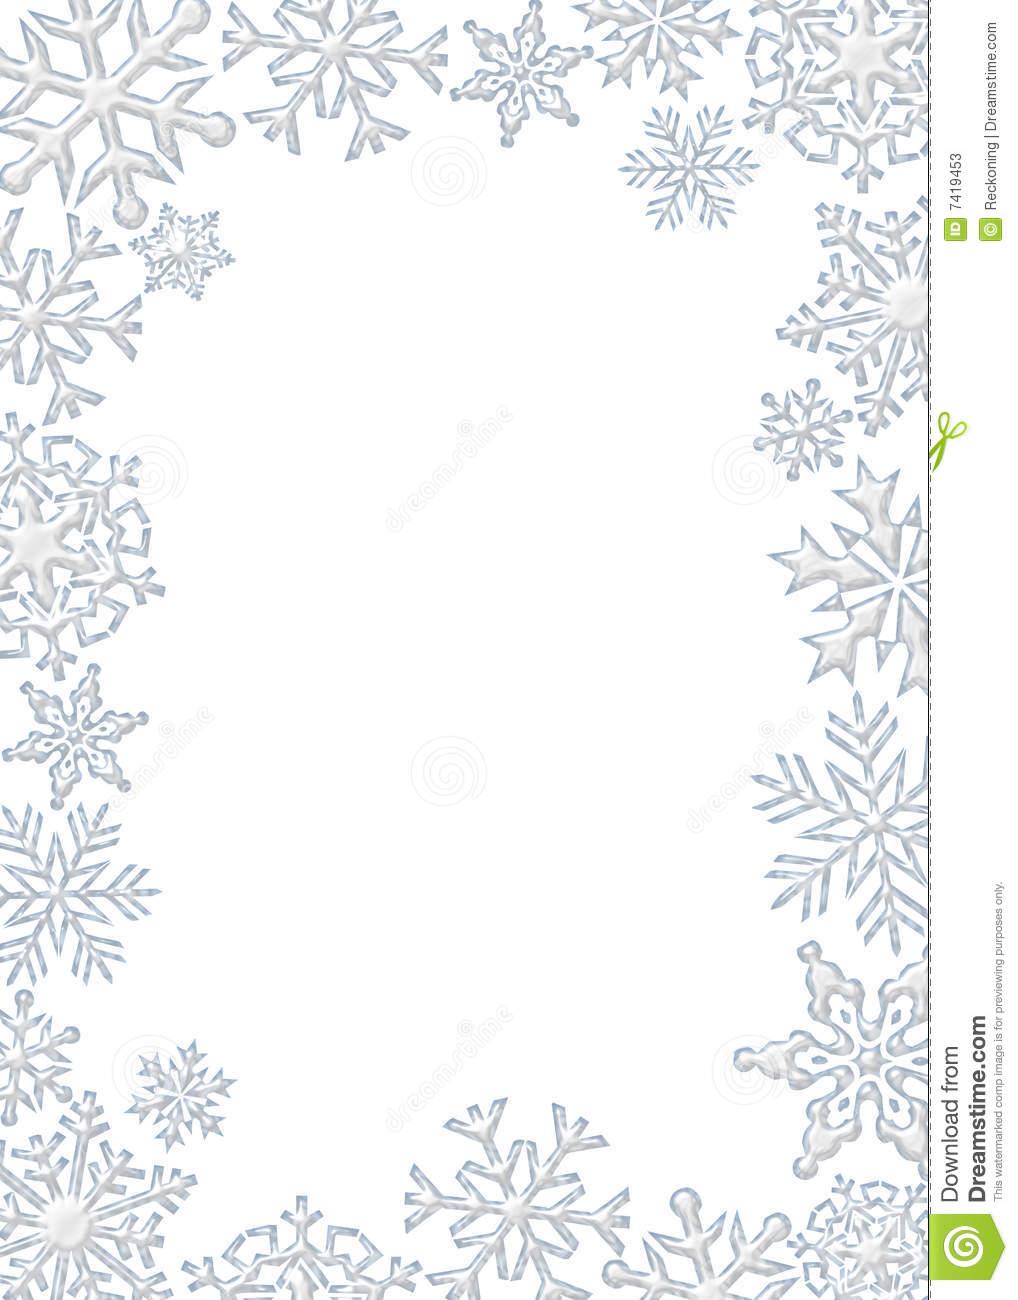 Graphic Illustration Of White Snowflake -Graphic Illustration Of White Snowflake Border-15